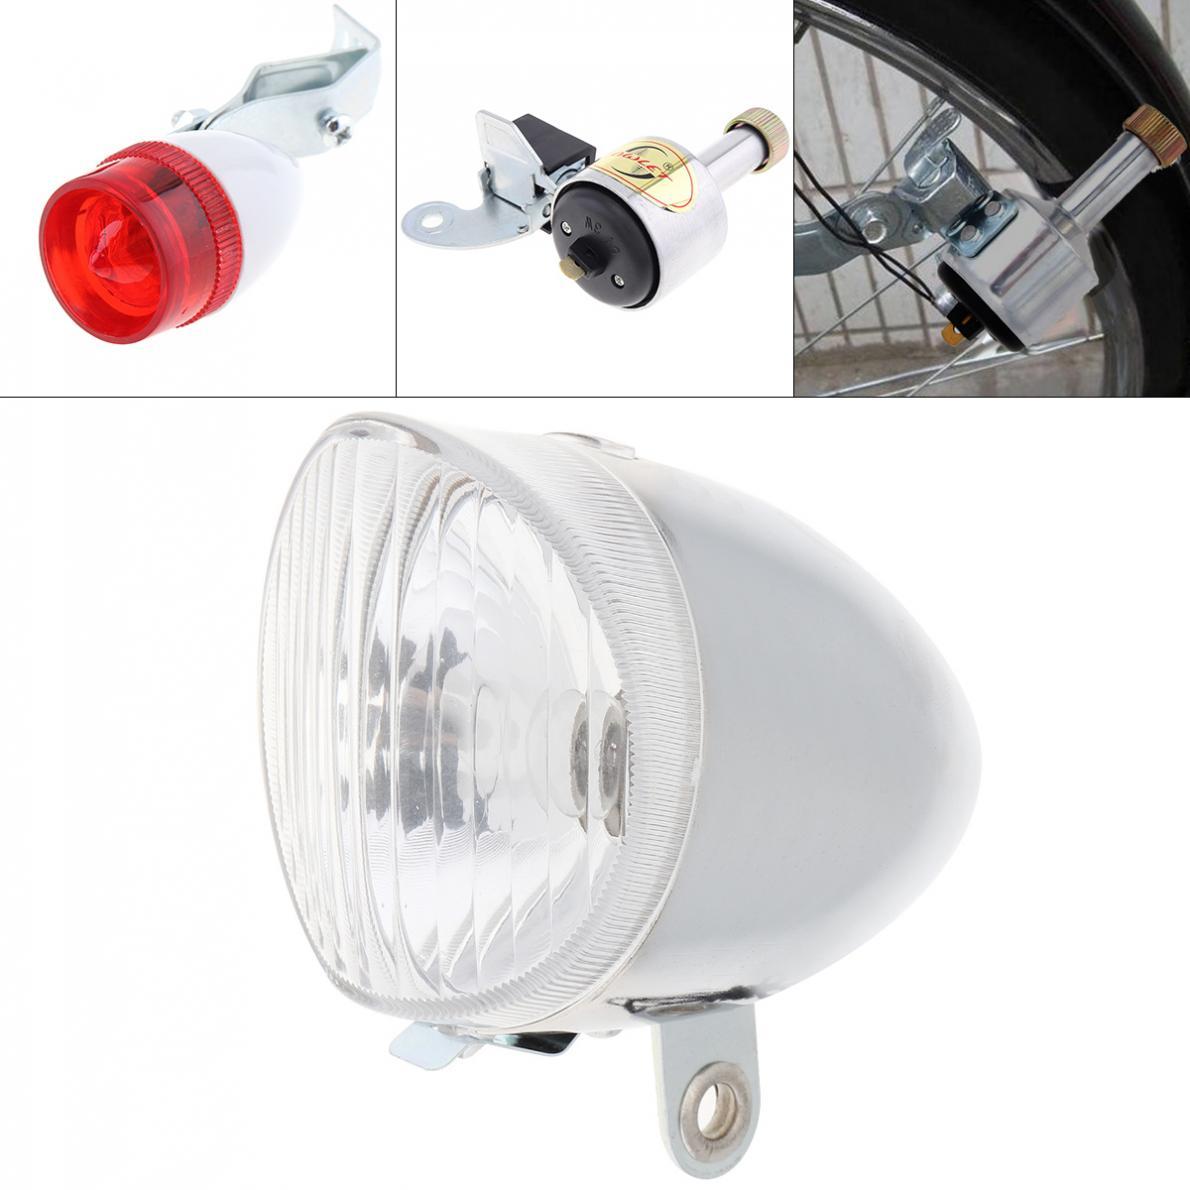 6V 3W Cycle  Bicycle Self-powered Front Rear Light Bike LED Dynamo Headlight